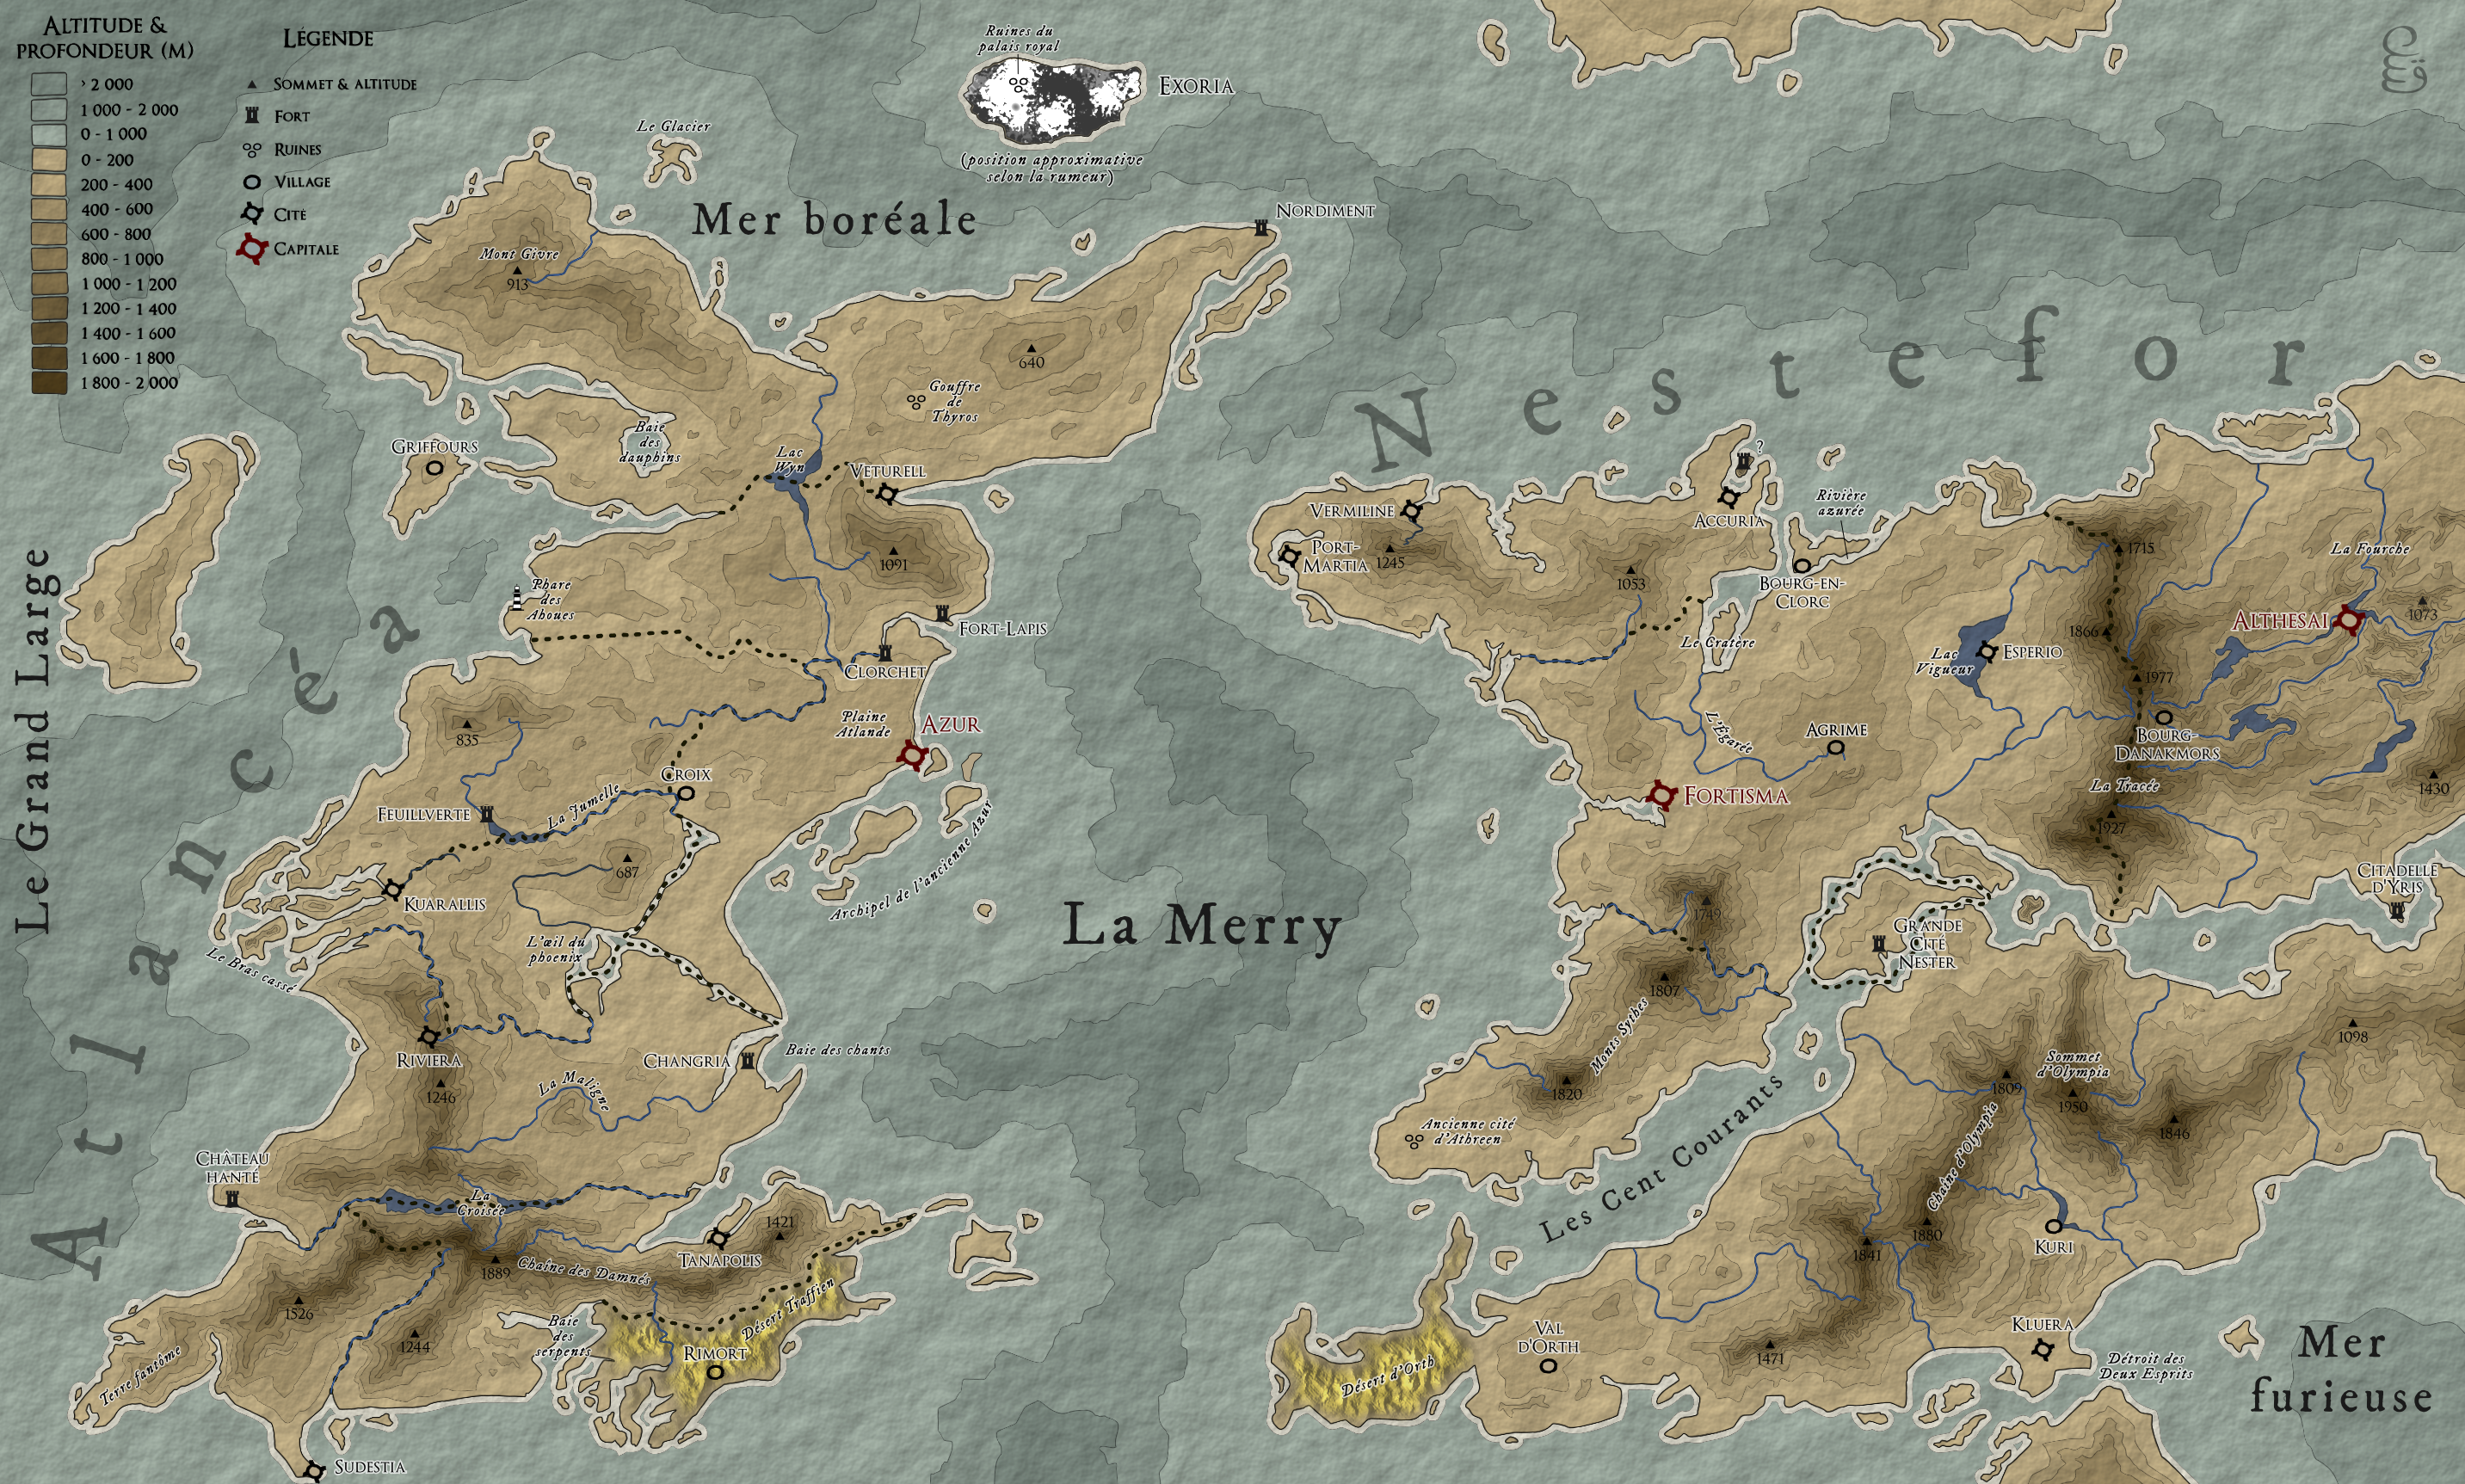 Carte de Nestefor et Atlancéa